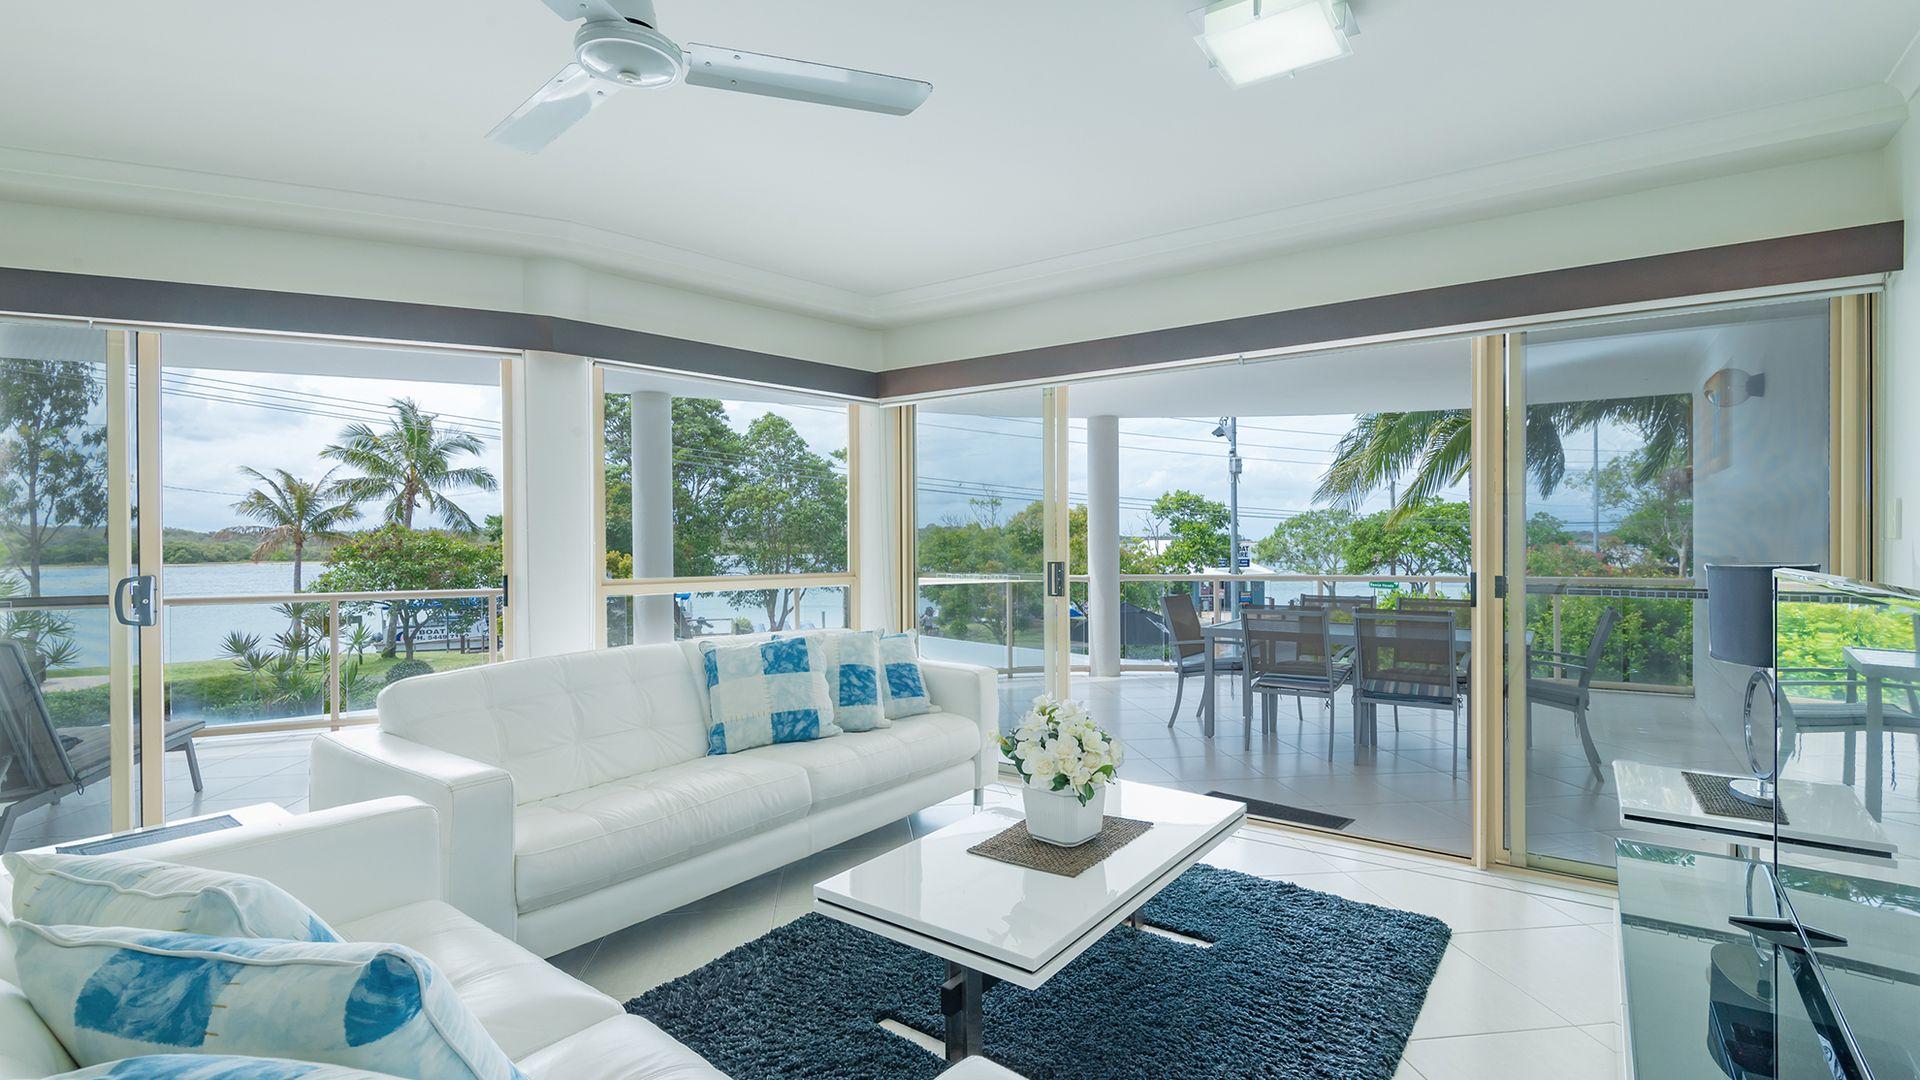 13/287 Gympie Terrace, Noosaville QLD 4566, Image 1